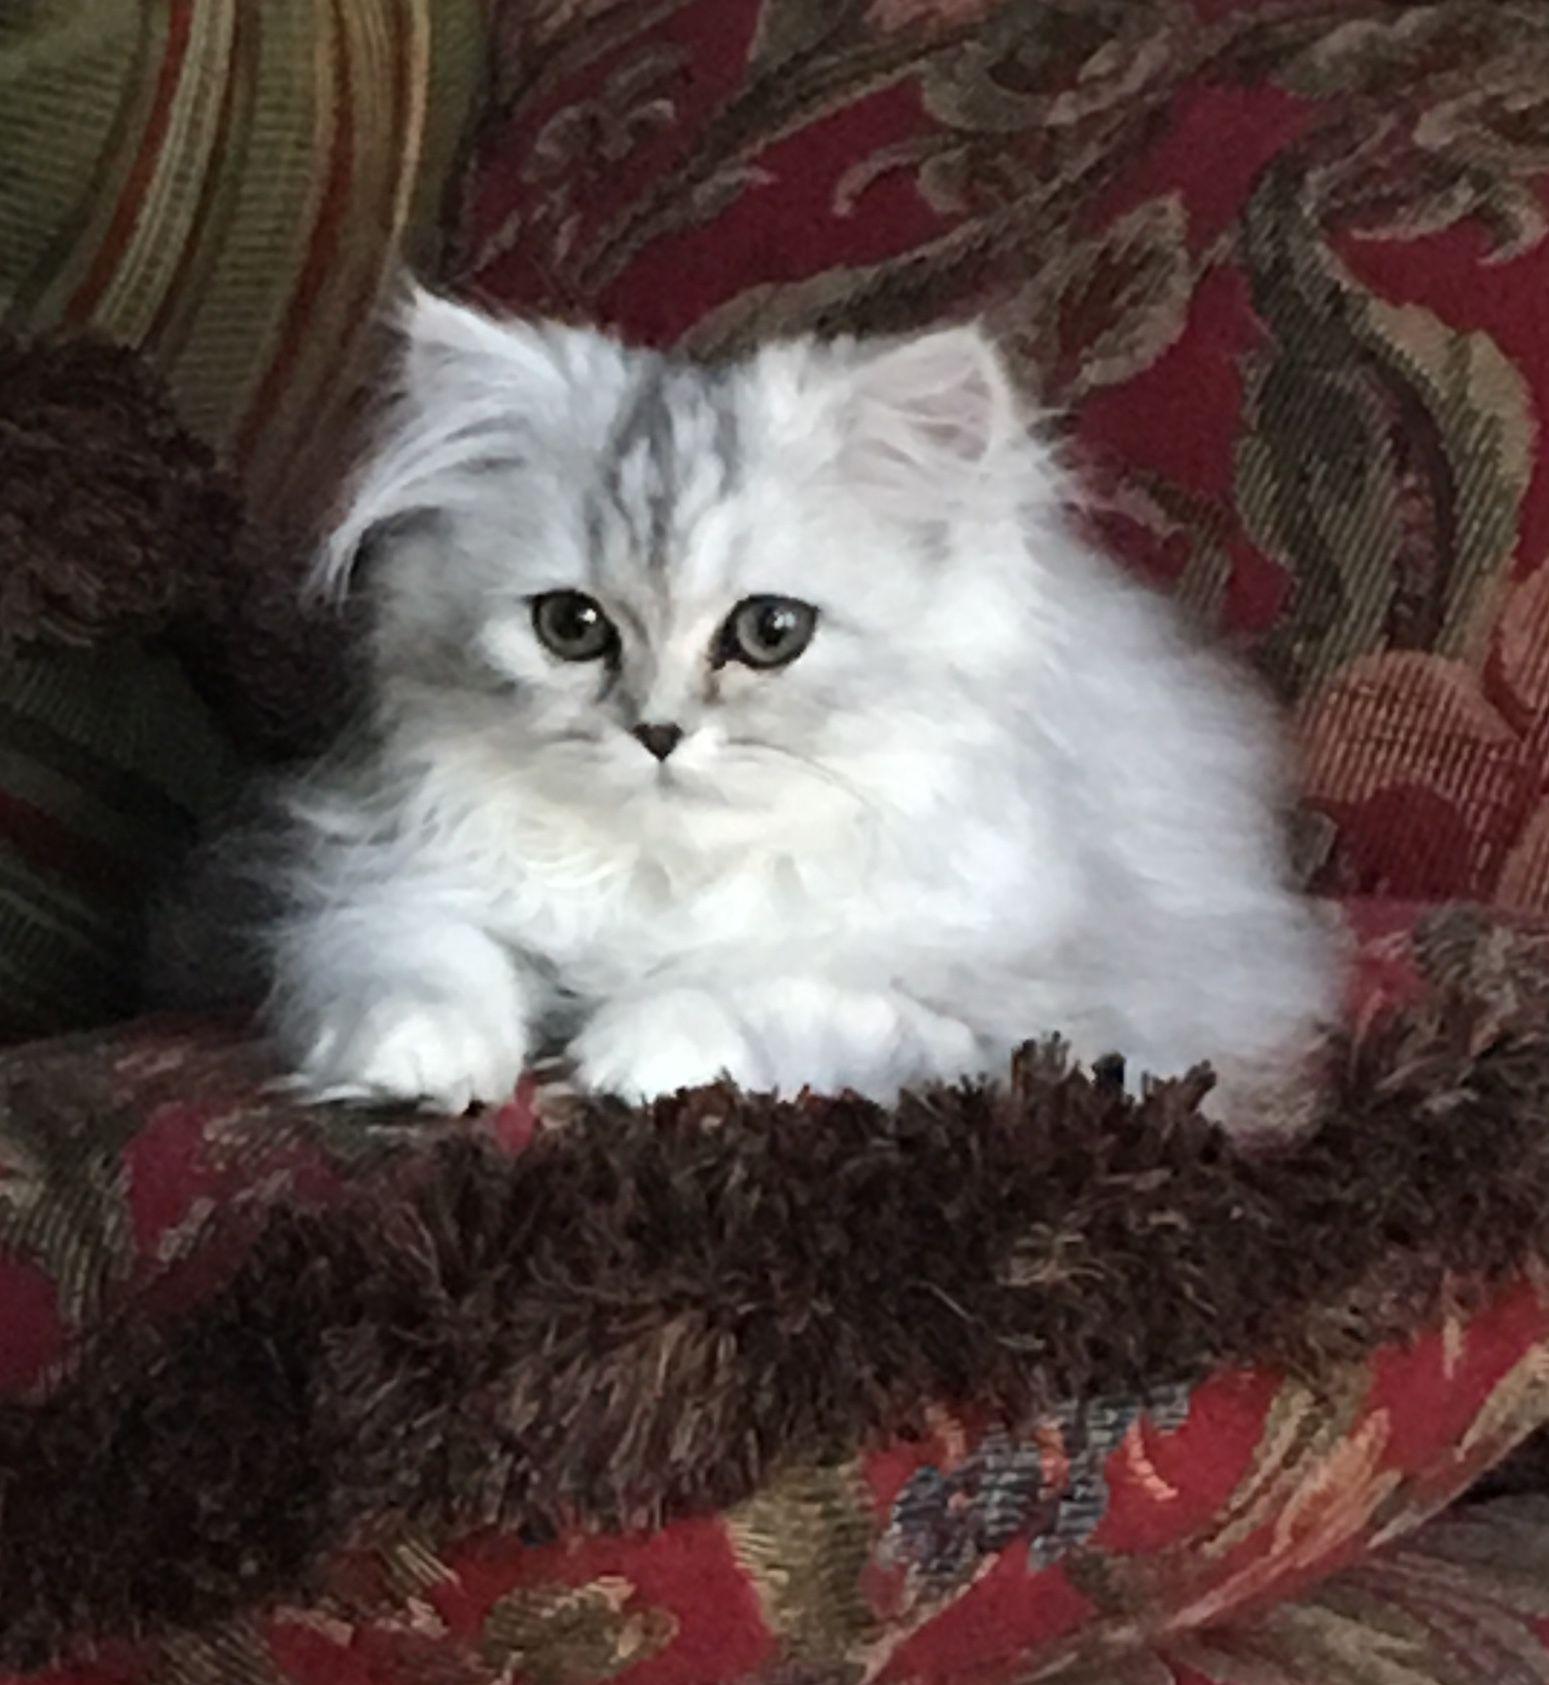 Pin By Powderpuff Persians On Powderpuffpersians Com Persian Cat Doll Face Persian Cats For Sale Persian Cat